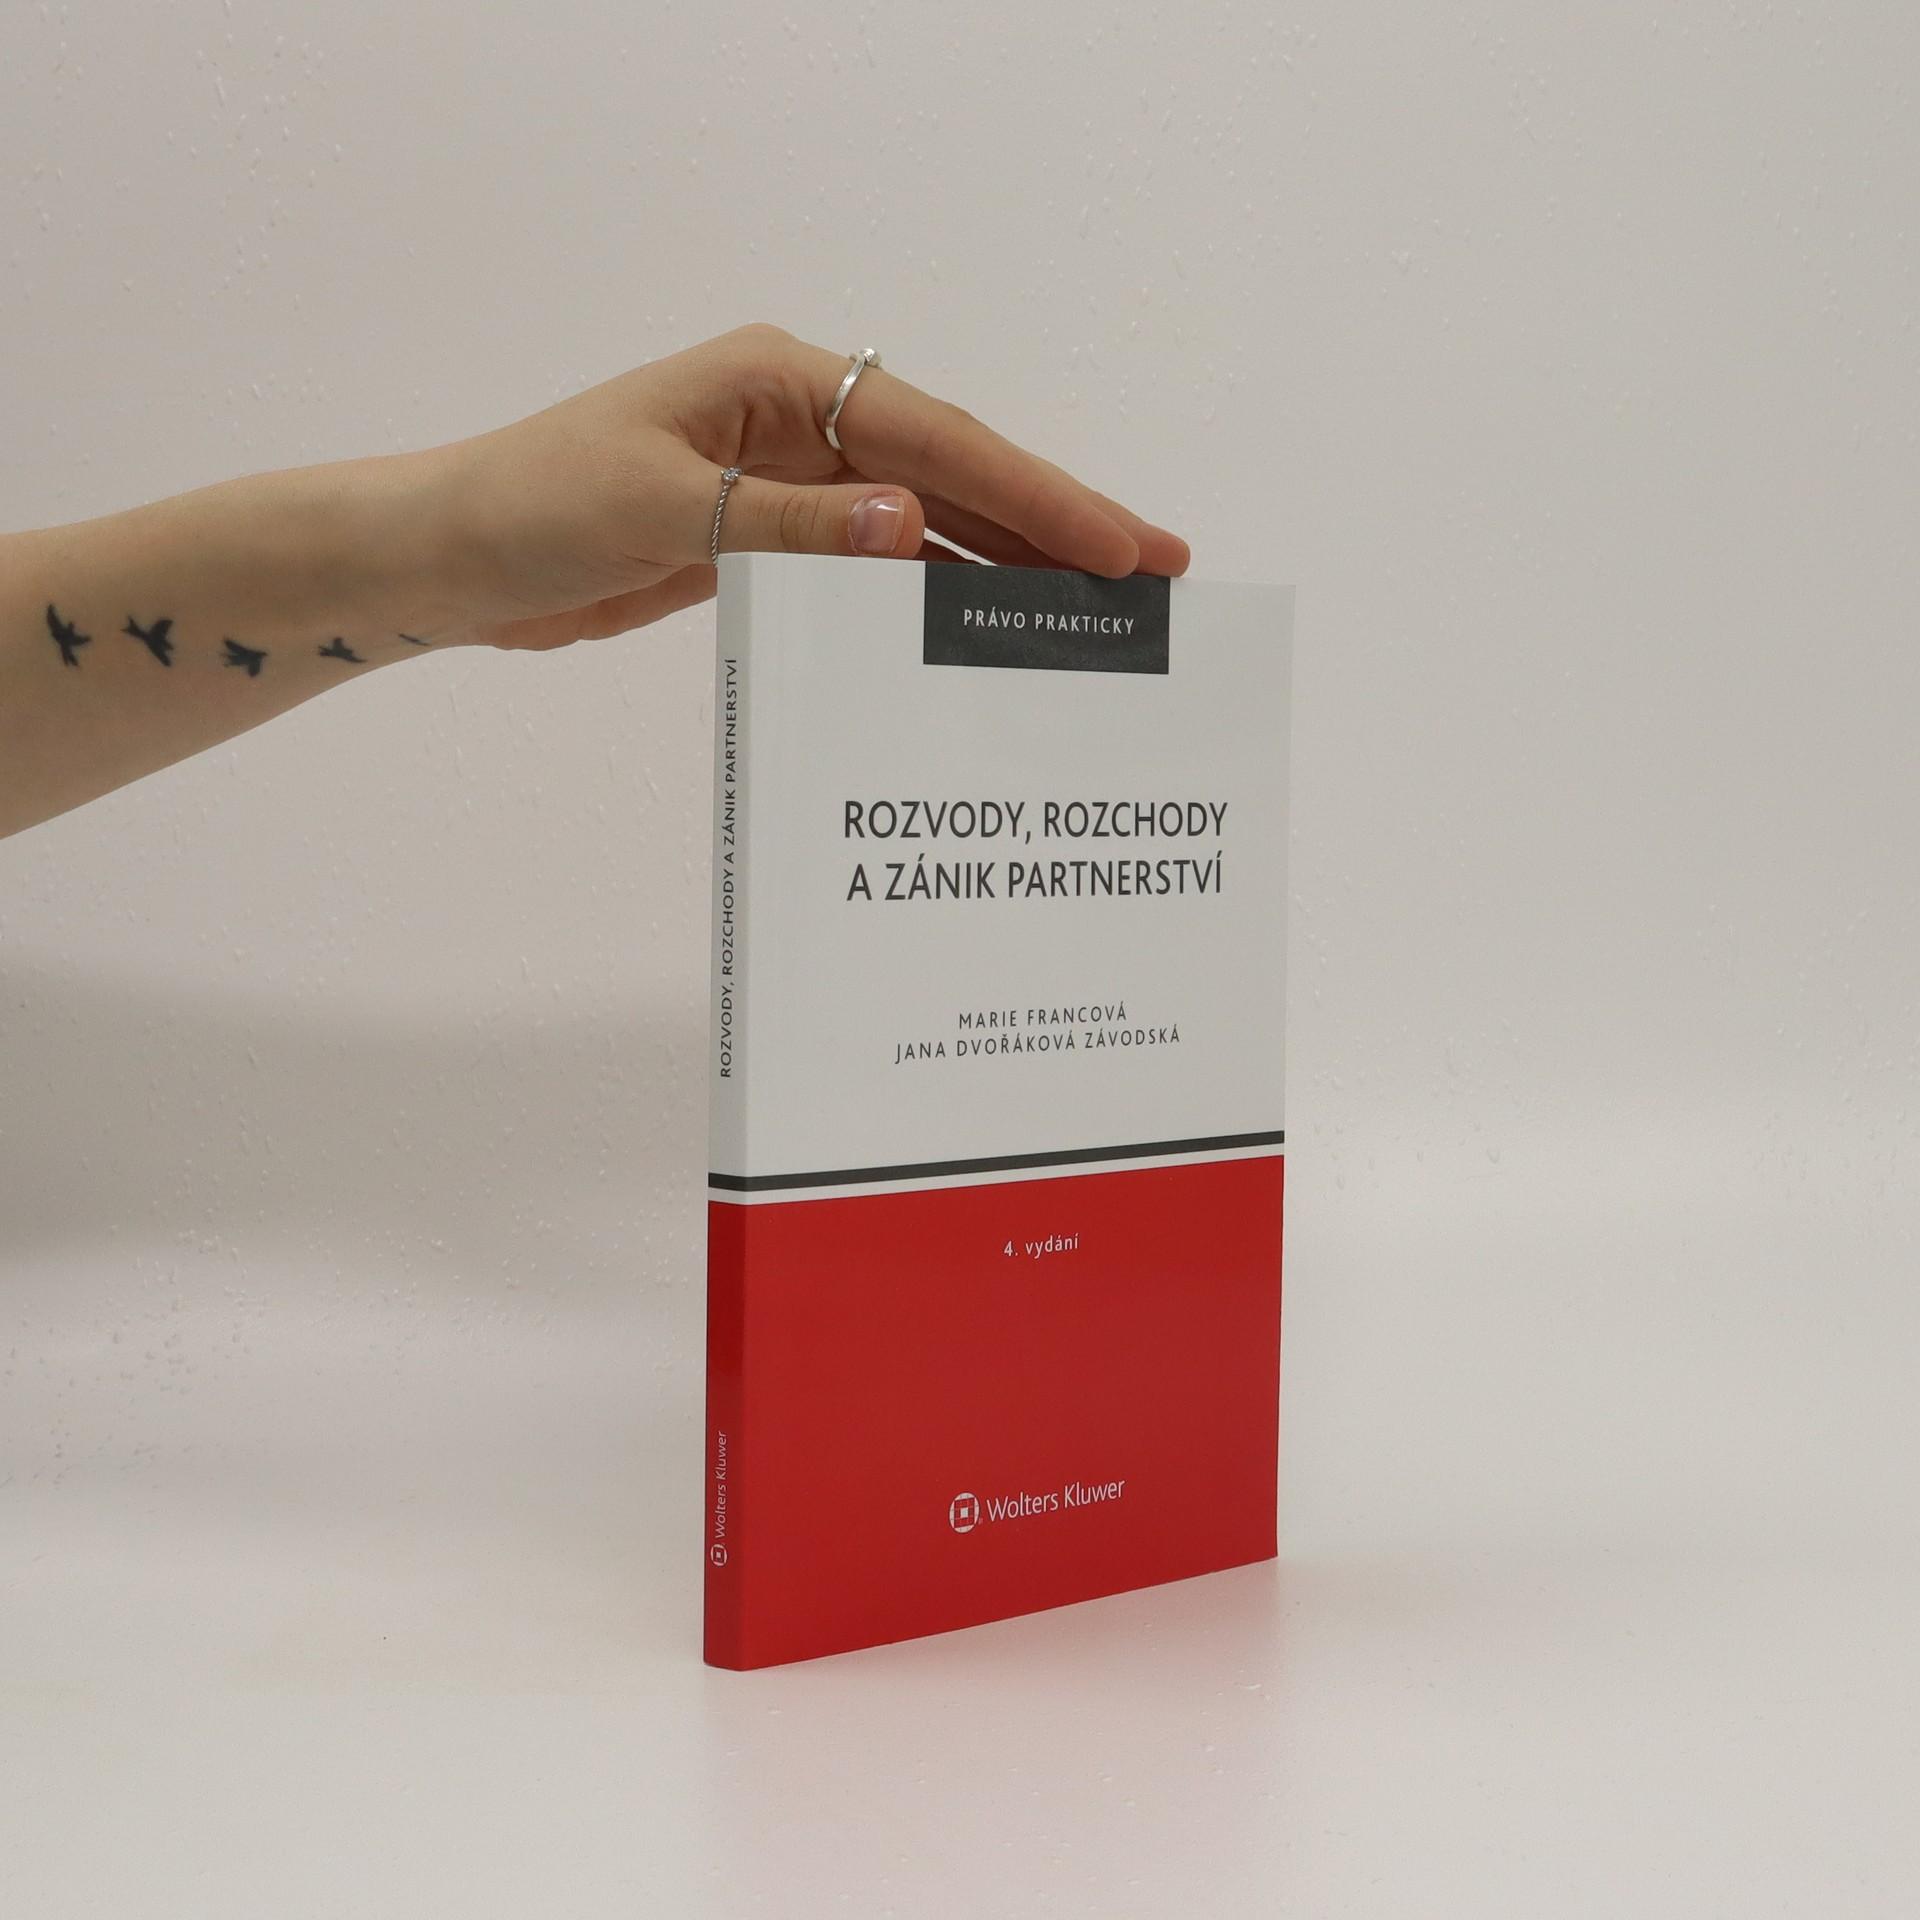 antikvární kniha Rozvody, rozchody a zánik partnerství, 2008